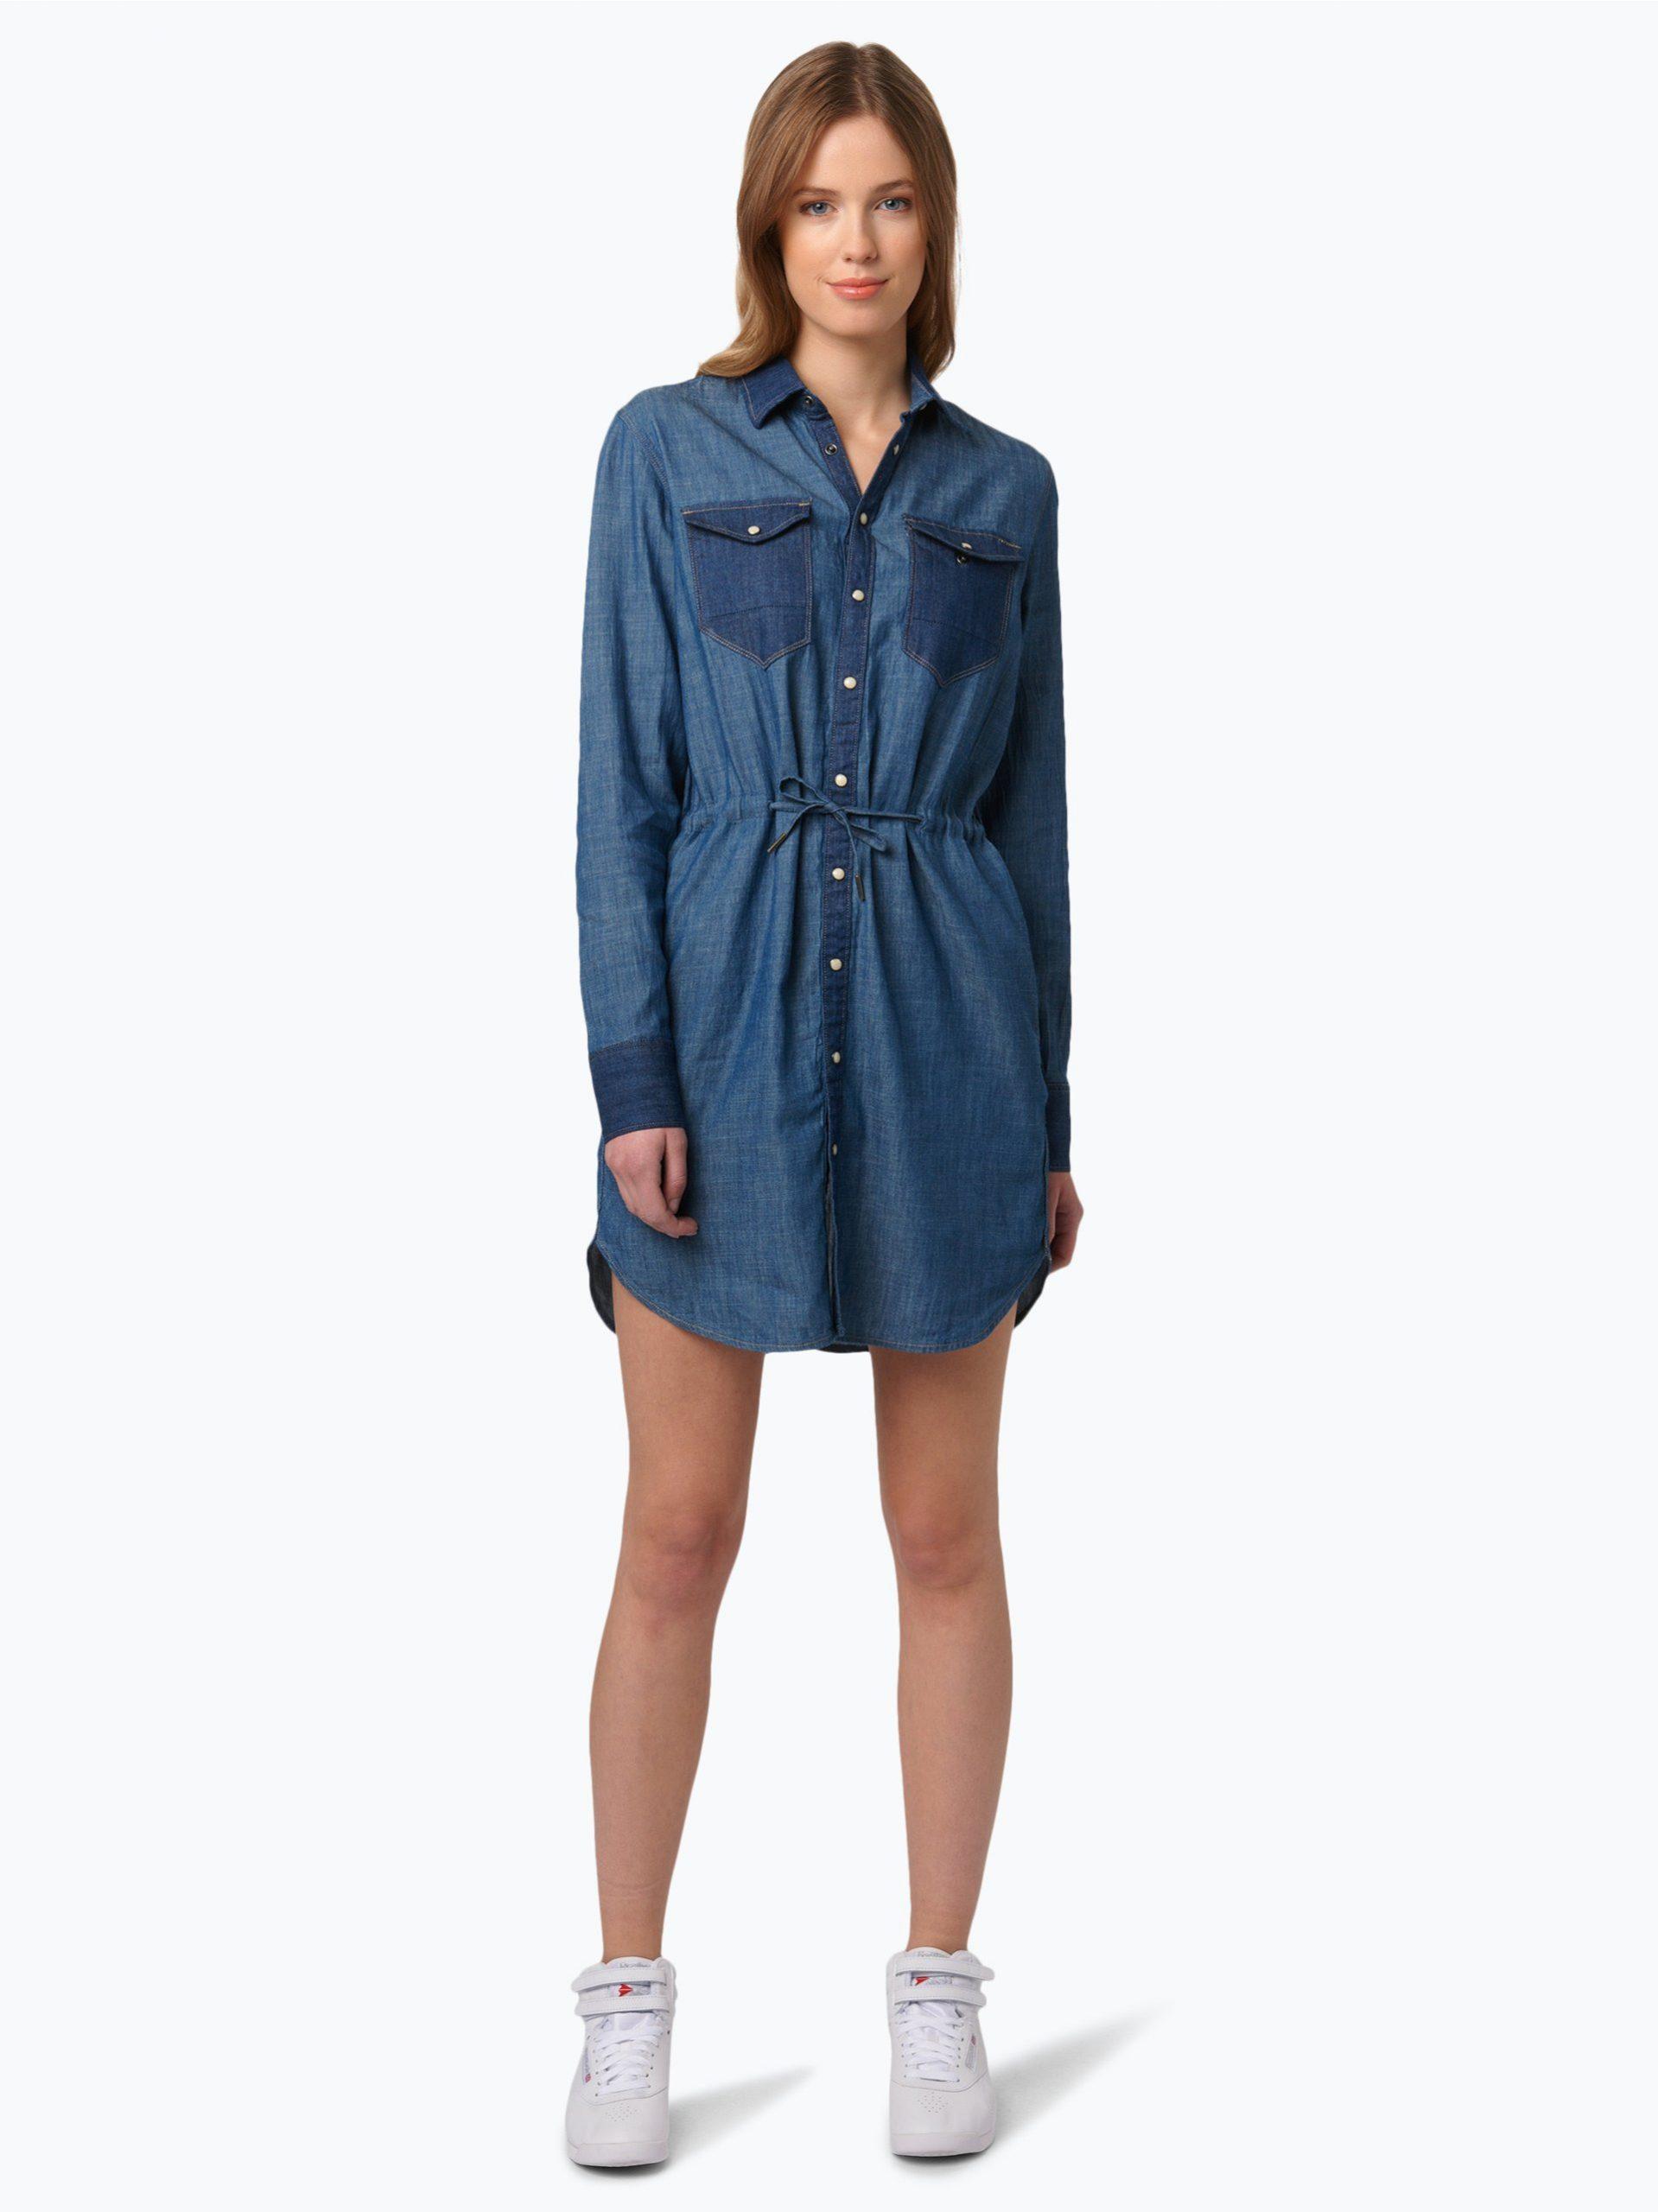 Gstar Damen Jeanskleid  Tacoma Online Kaufen  Vangraaf